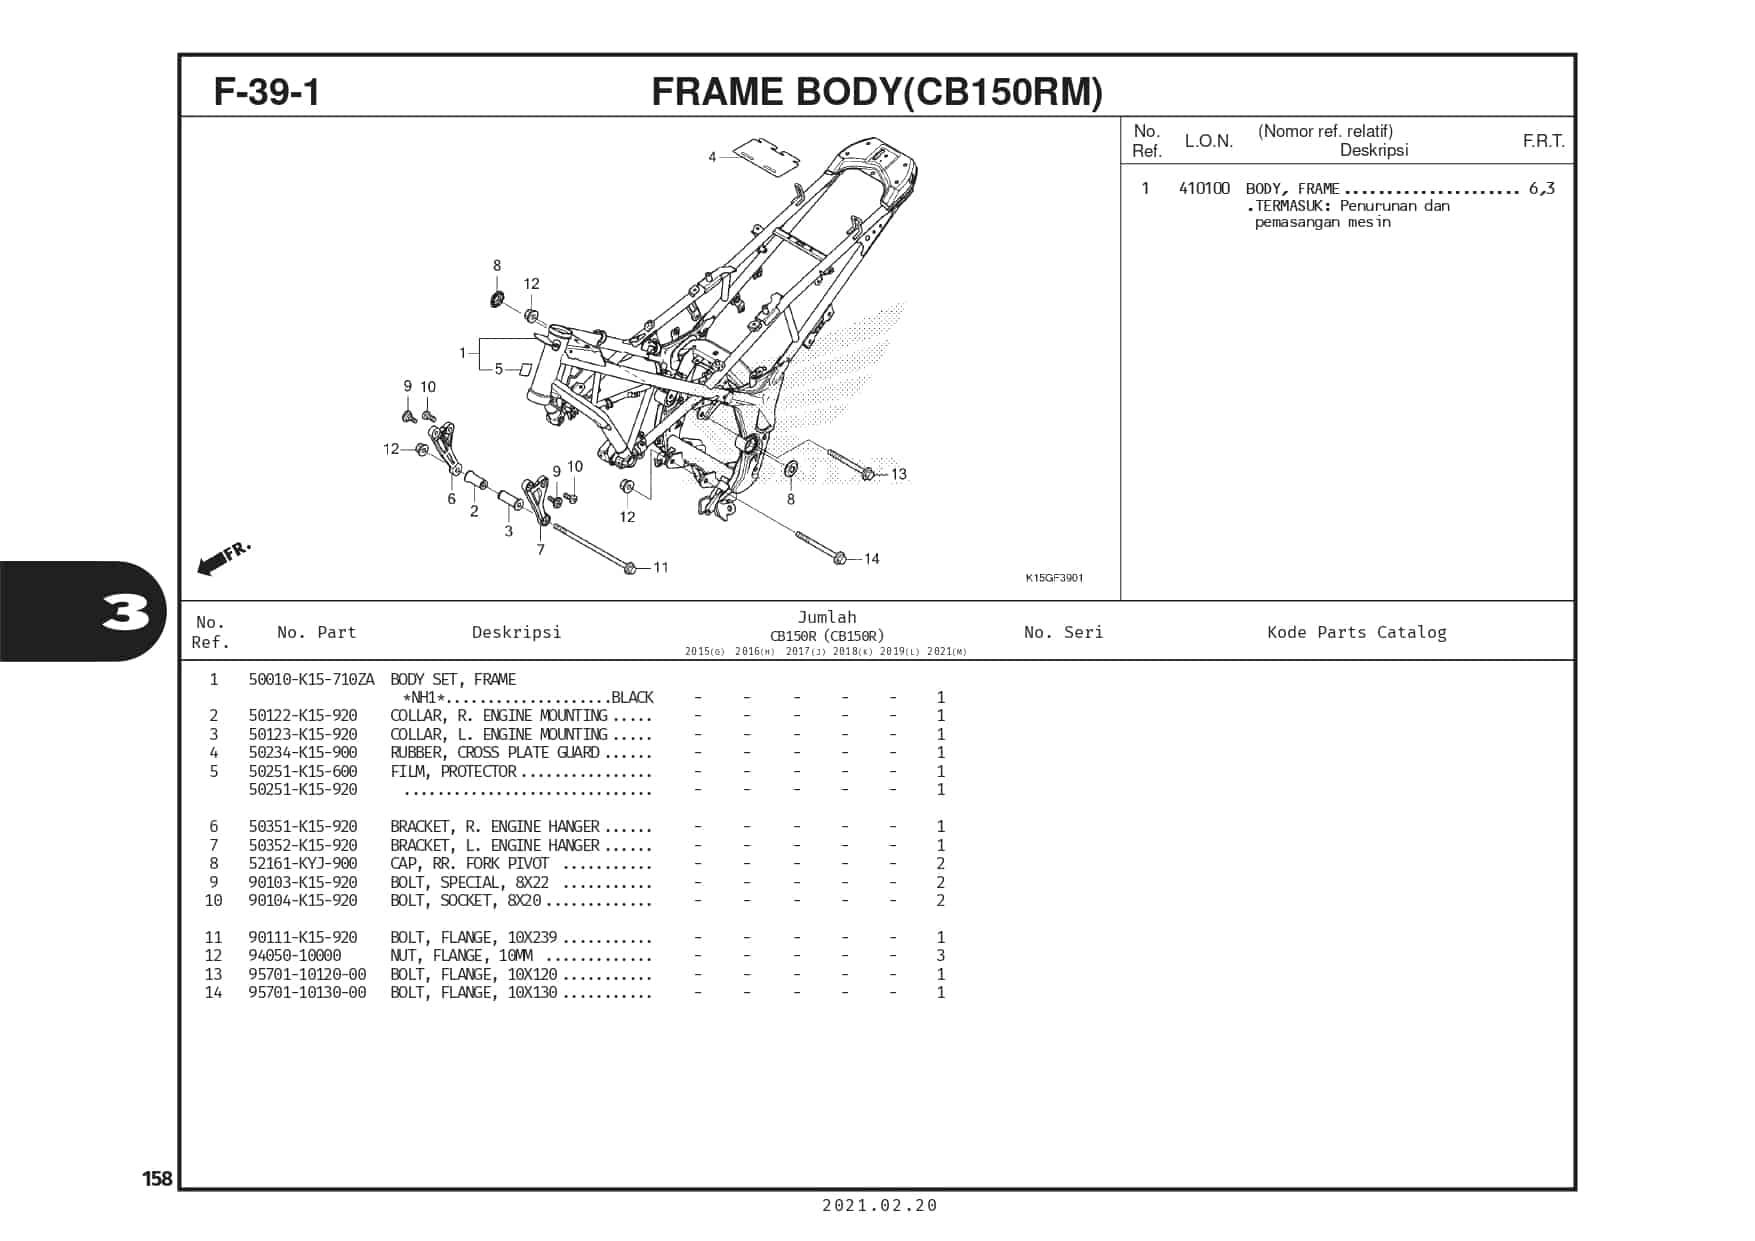 F-39-1 Frame Body(CB150RM)